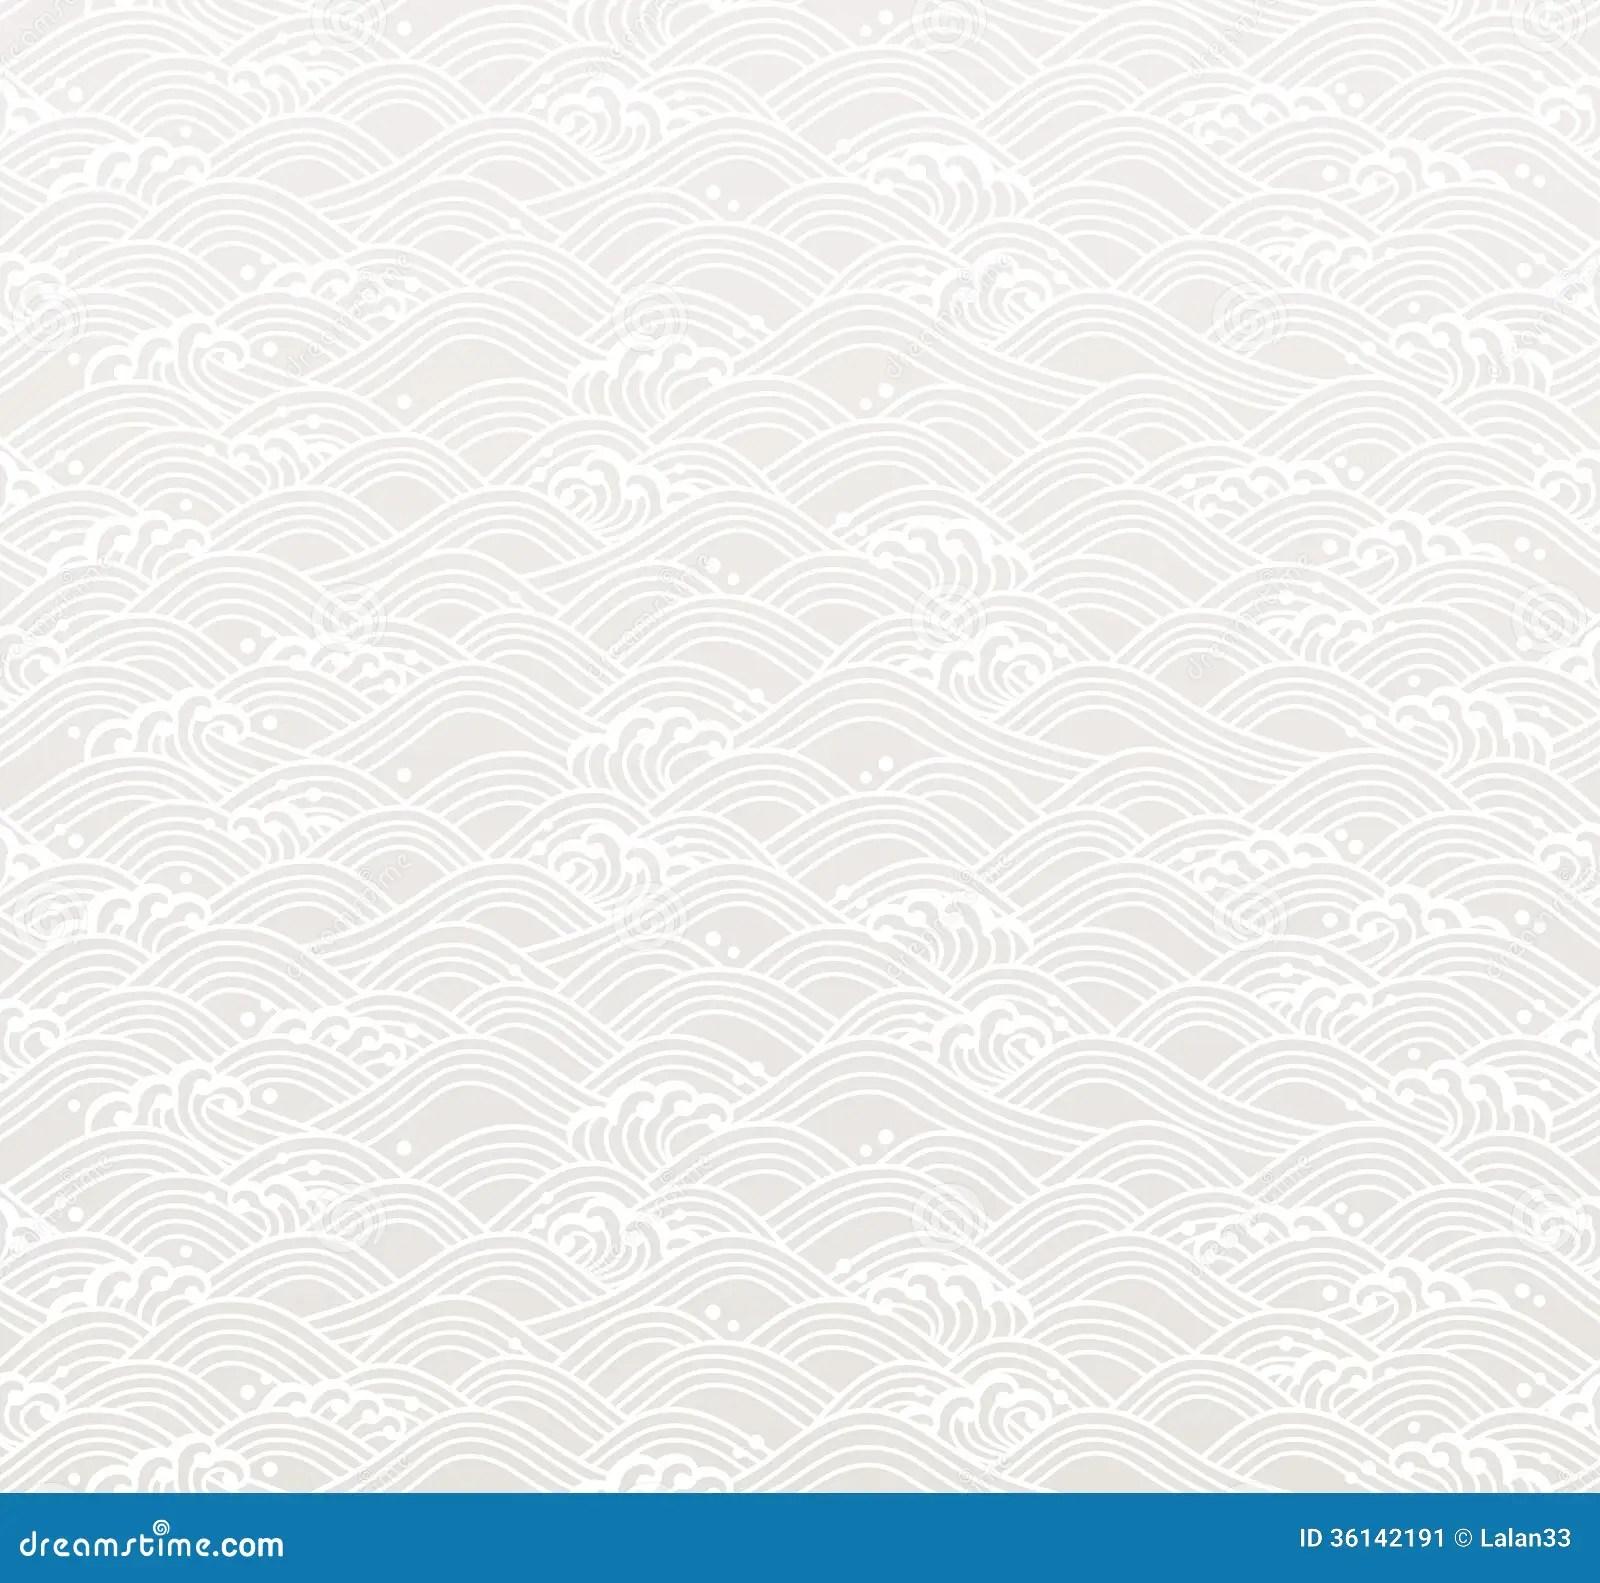 Seamless Ocean Wave Pattern Stock Image